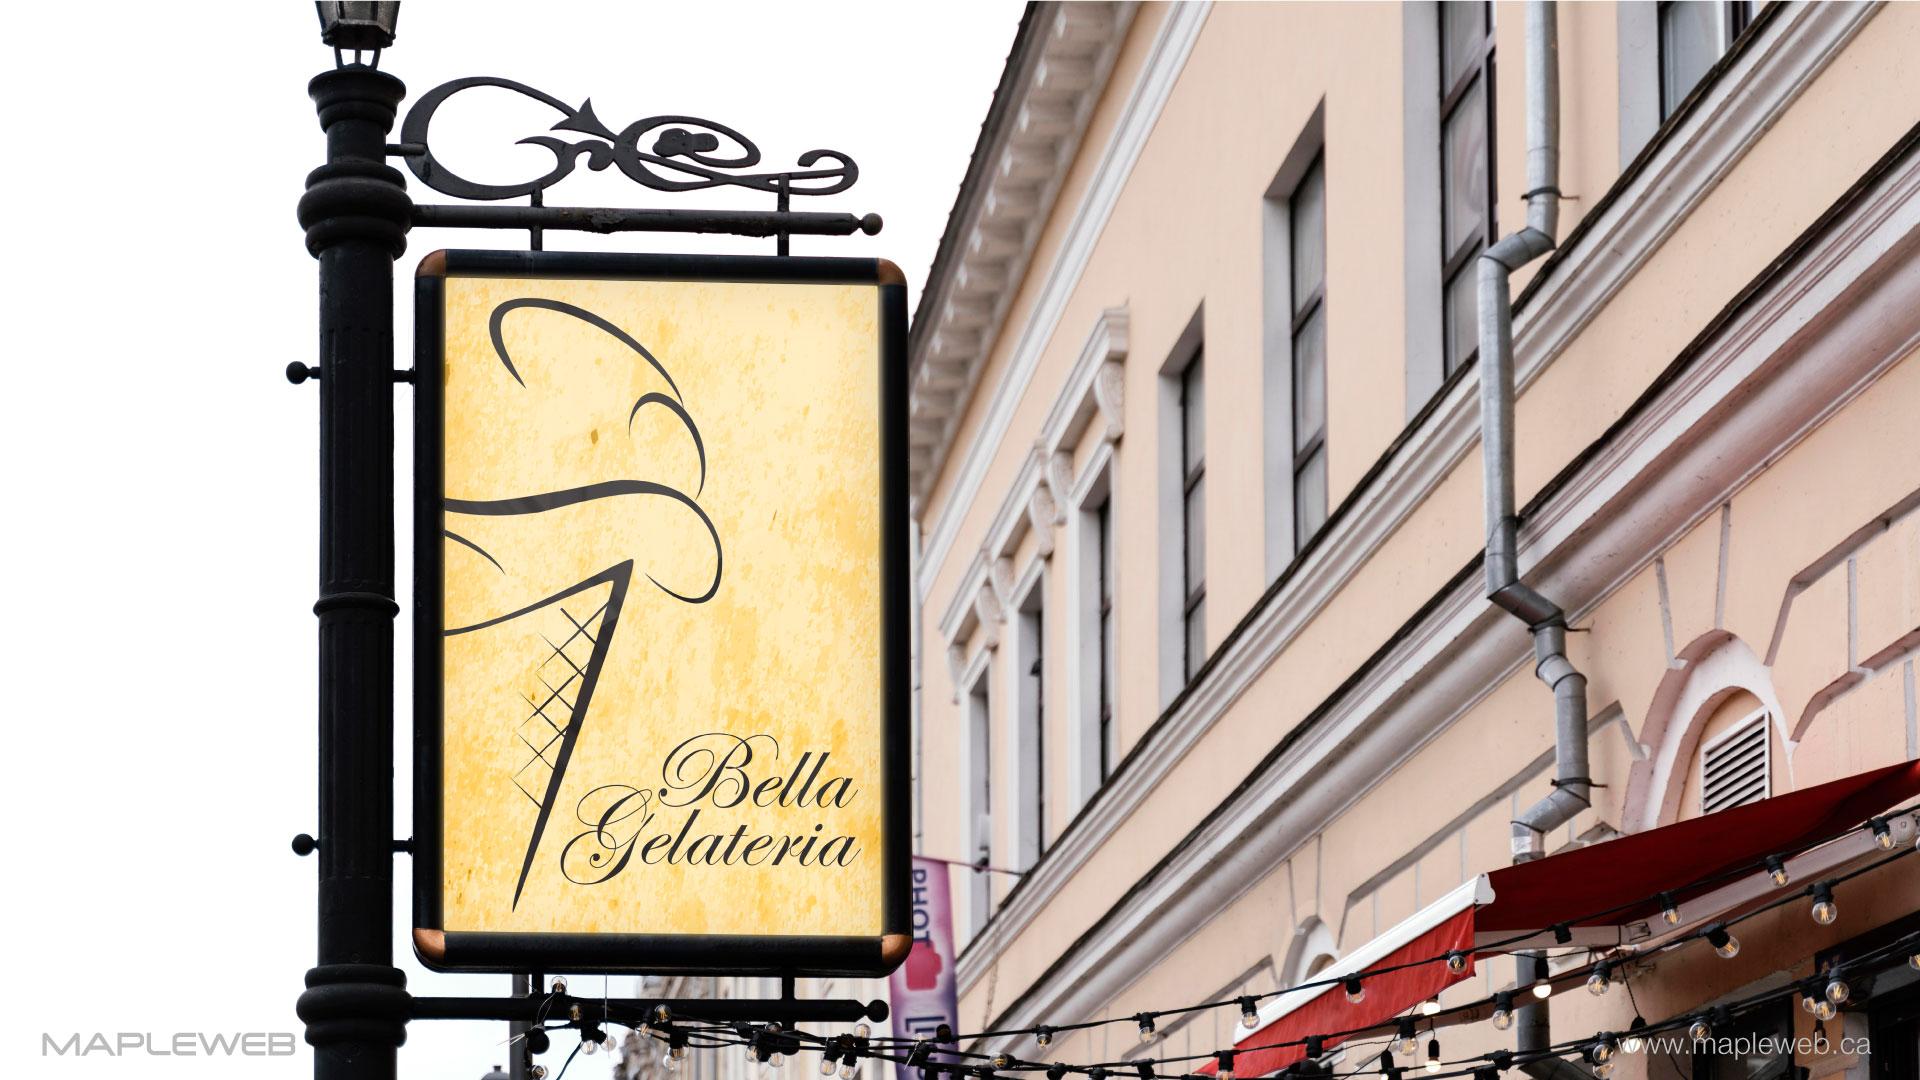 bella-gelateria-brand-logo-design-by-mapleweb-vancouver-canada-cap-mock